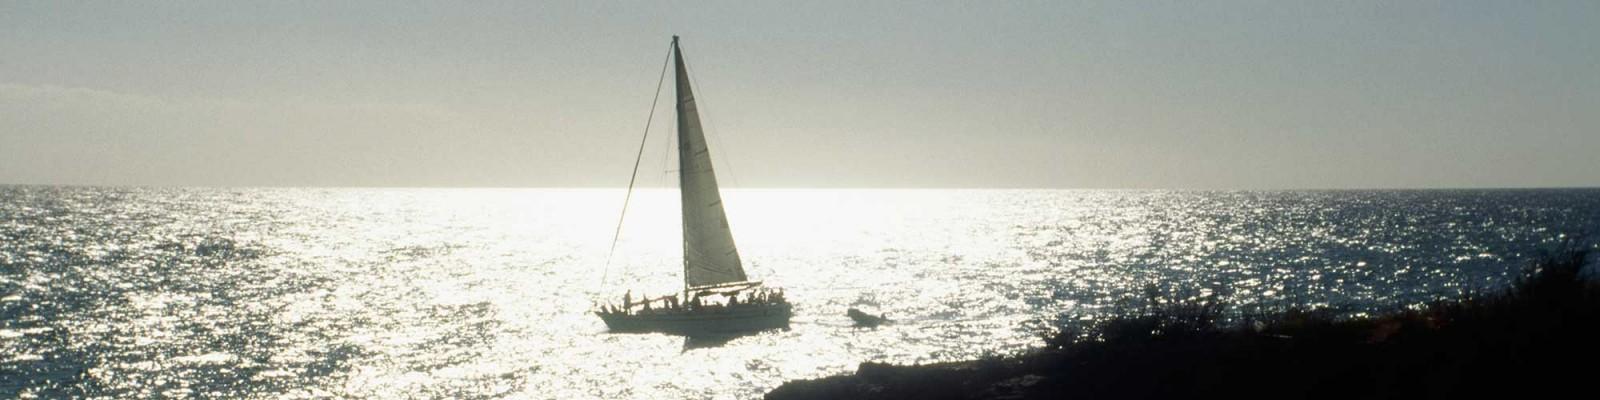 Tenrag Yacht Charter: Caribbean charters